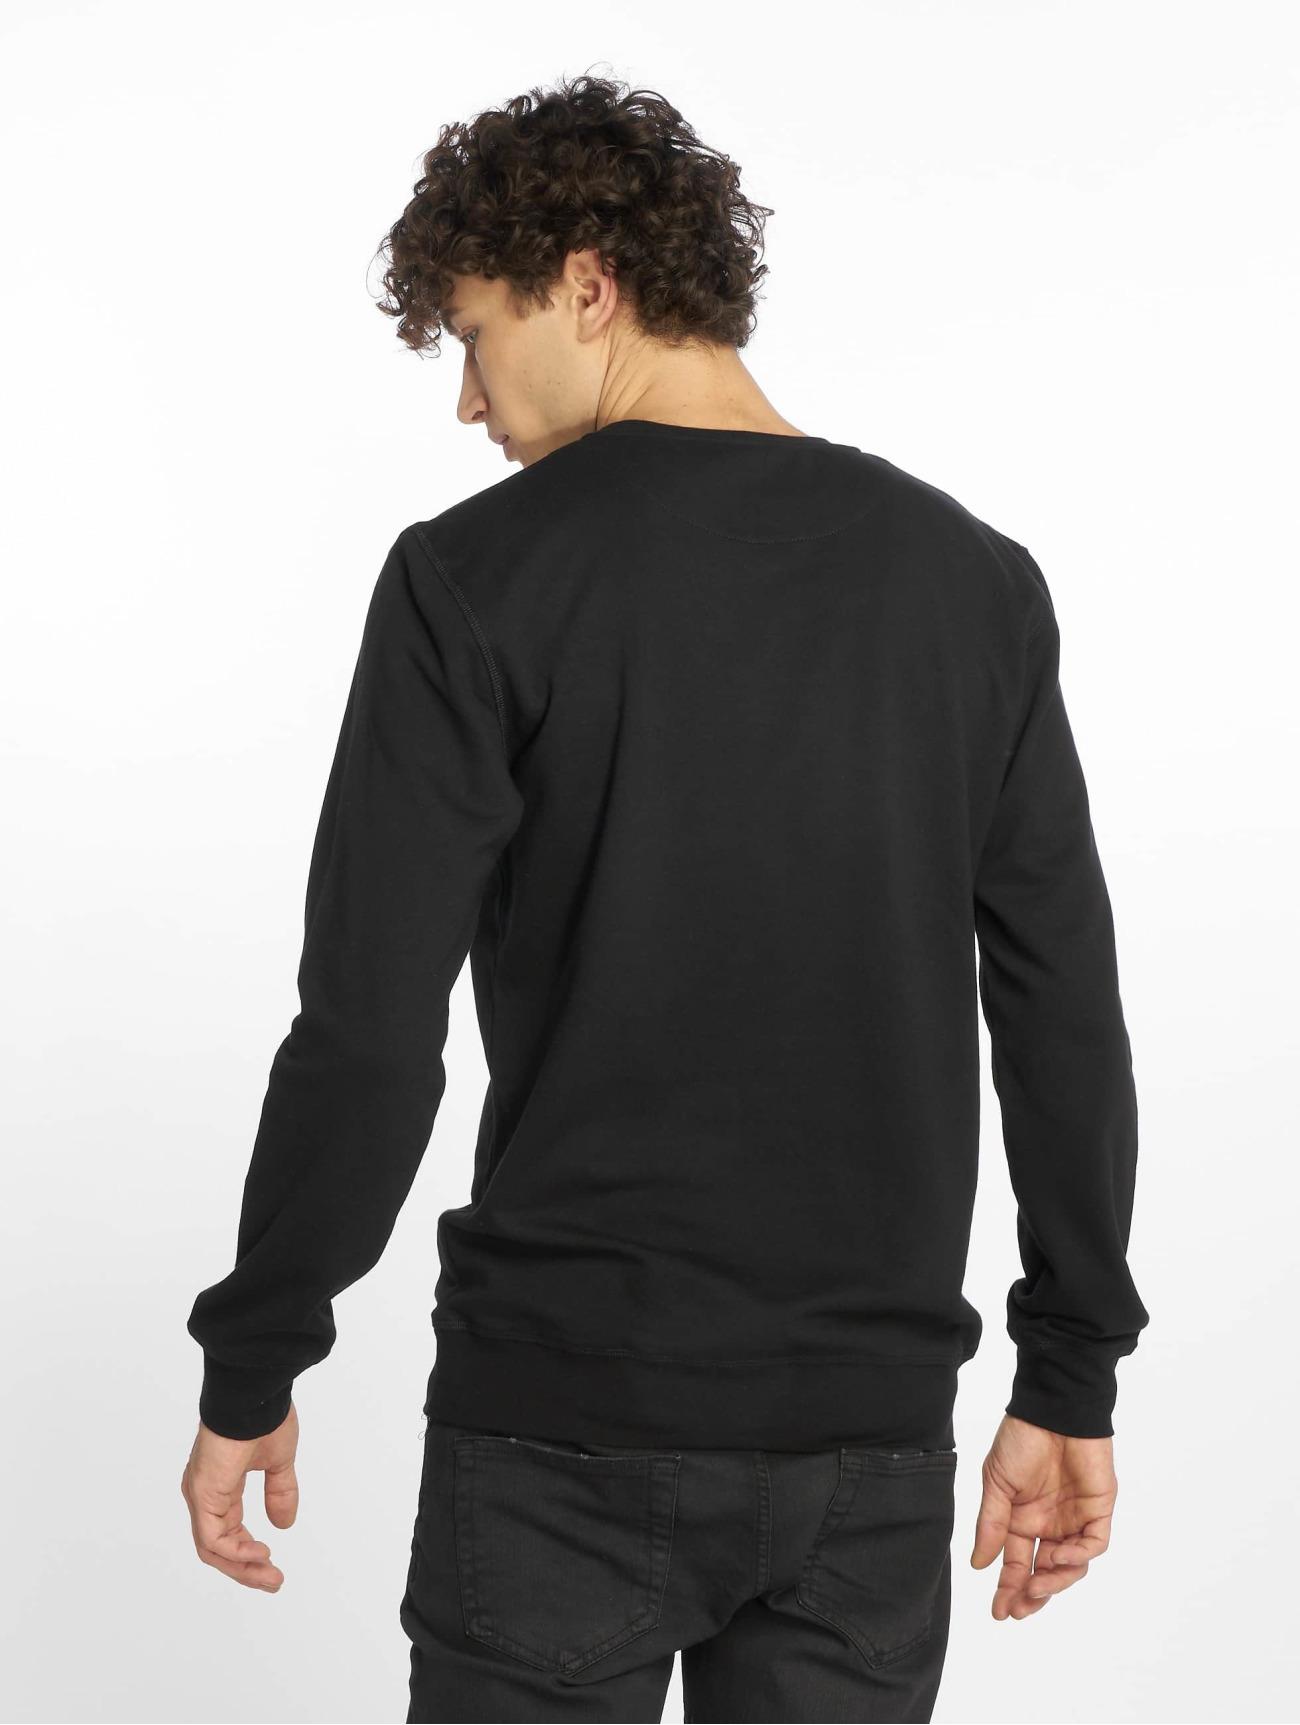 Merchcode | ACDC Christmas  noir Homme Sweat & Pull  619727| Homme Hauts